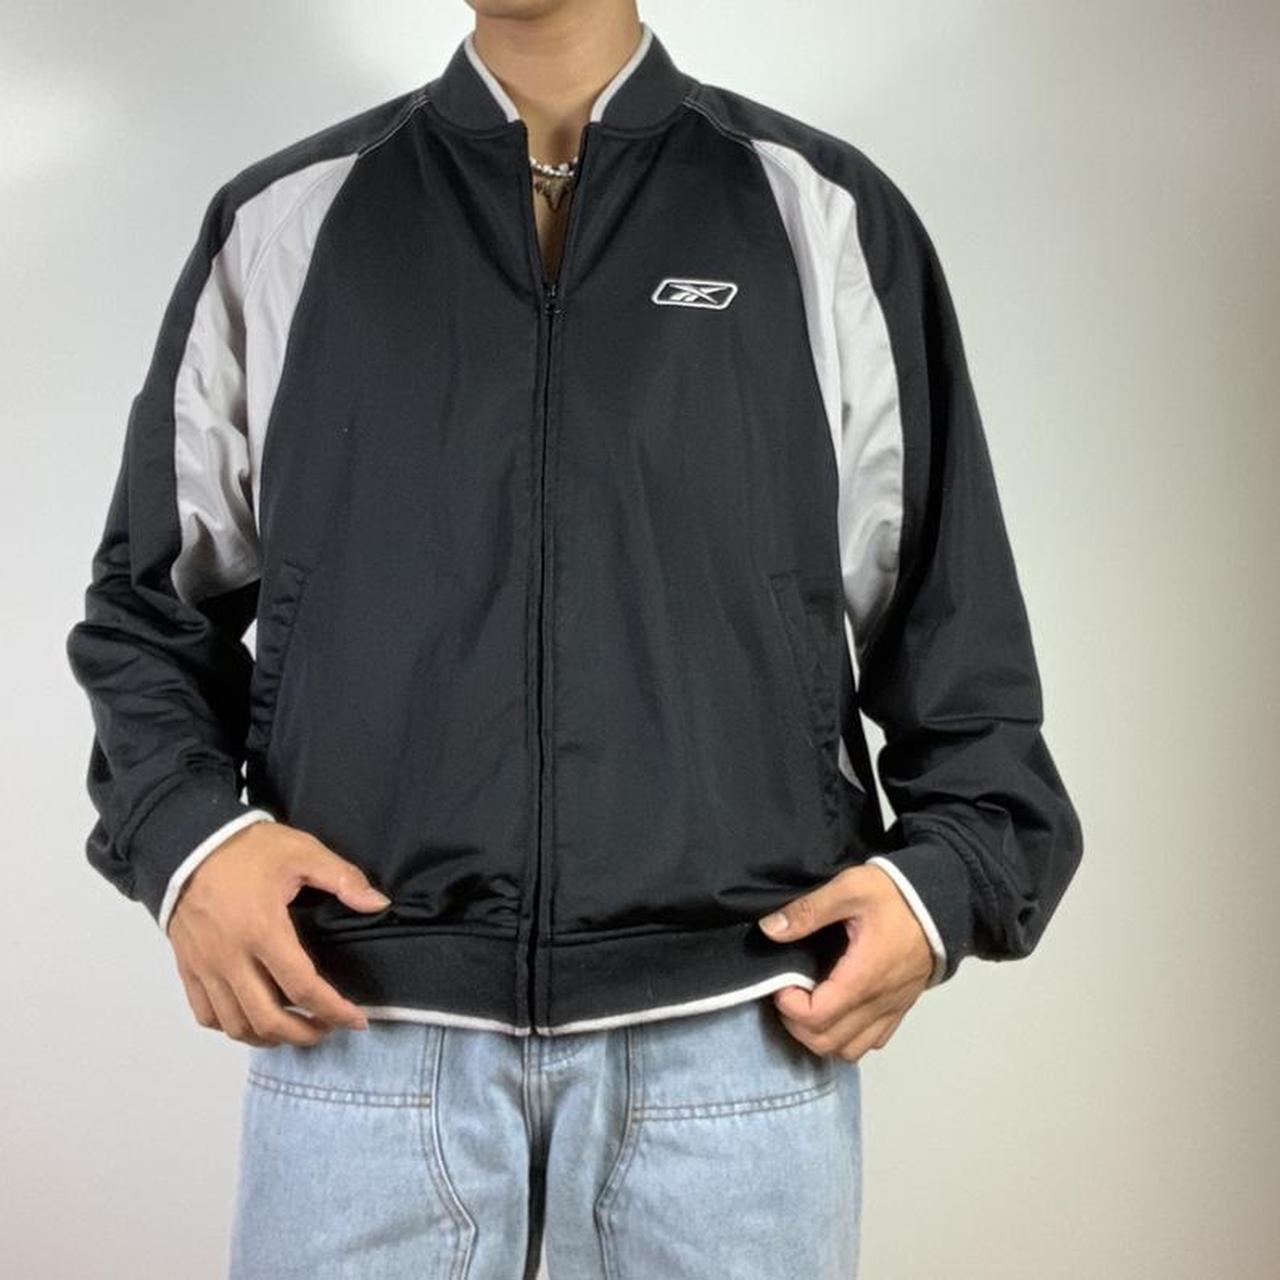 Product Image 1 - Vintage Y2K Reebok Track Jacket  Size